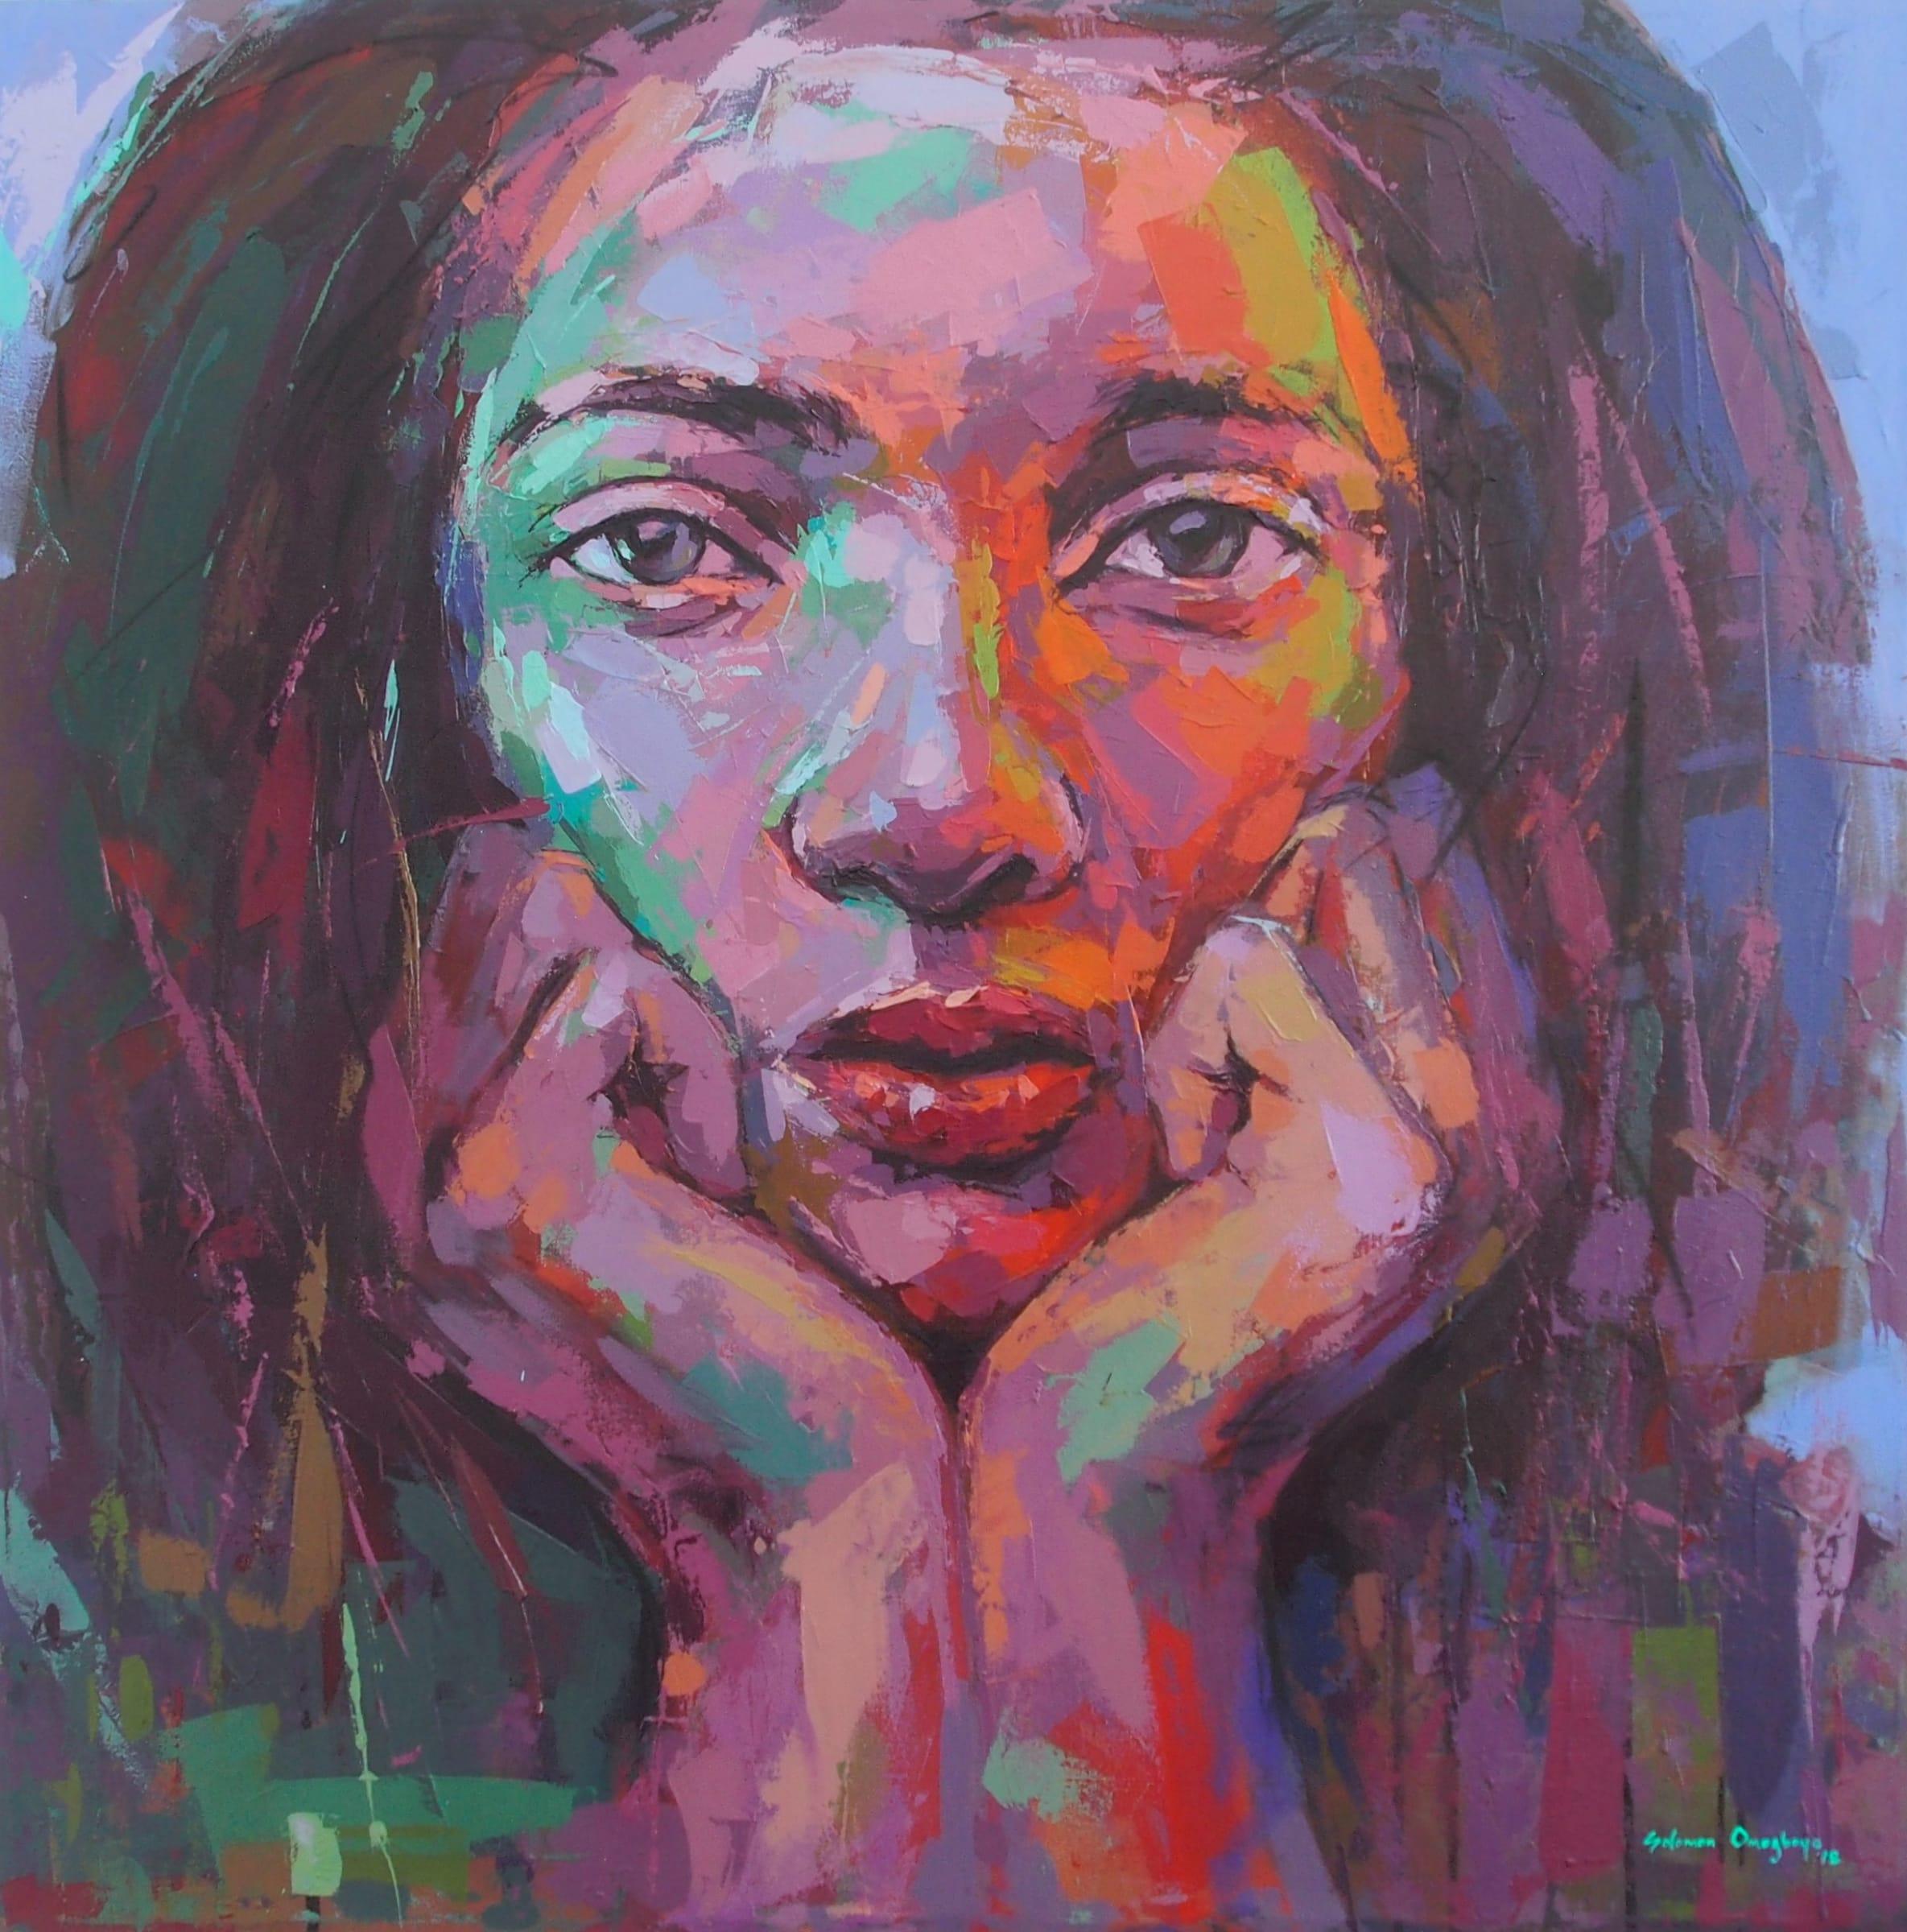 <span class=&#34;link fancybox-details-link&#34;><a href=&#34;/artworks/categories/121/2012-solomon-omogboye-reflection-2-the-gaze-2018/&#34;>View Detail Page</a></span><div class=&#34;artist&#34;><strong>Solomon Omogboye</strong></div> <div class=&#34;title&#34;><em>Reflection 2 (The Gaze)</em>, 2018</div> <div class=&#34;medium&#34;>Acrylic On Canvas</div> <div class=&#34;dimensions&#34;>130.5cm x 130.5cm</div><div class=&#34;price&#34;>R34,000.00</div>